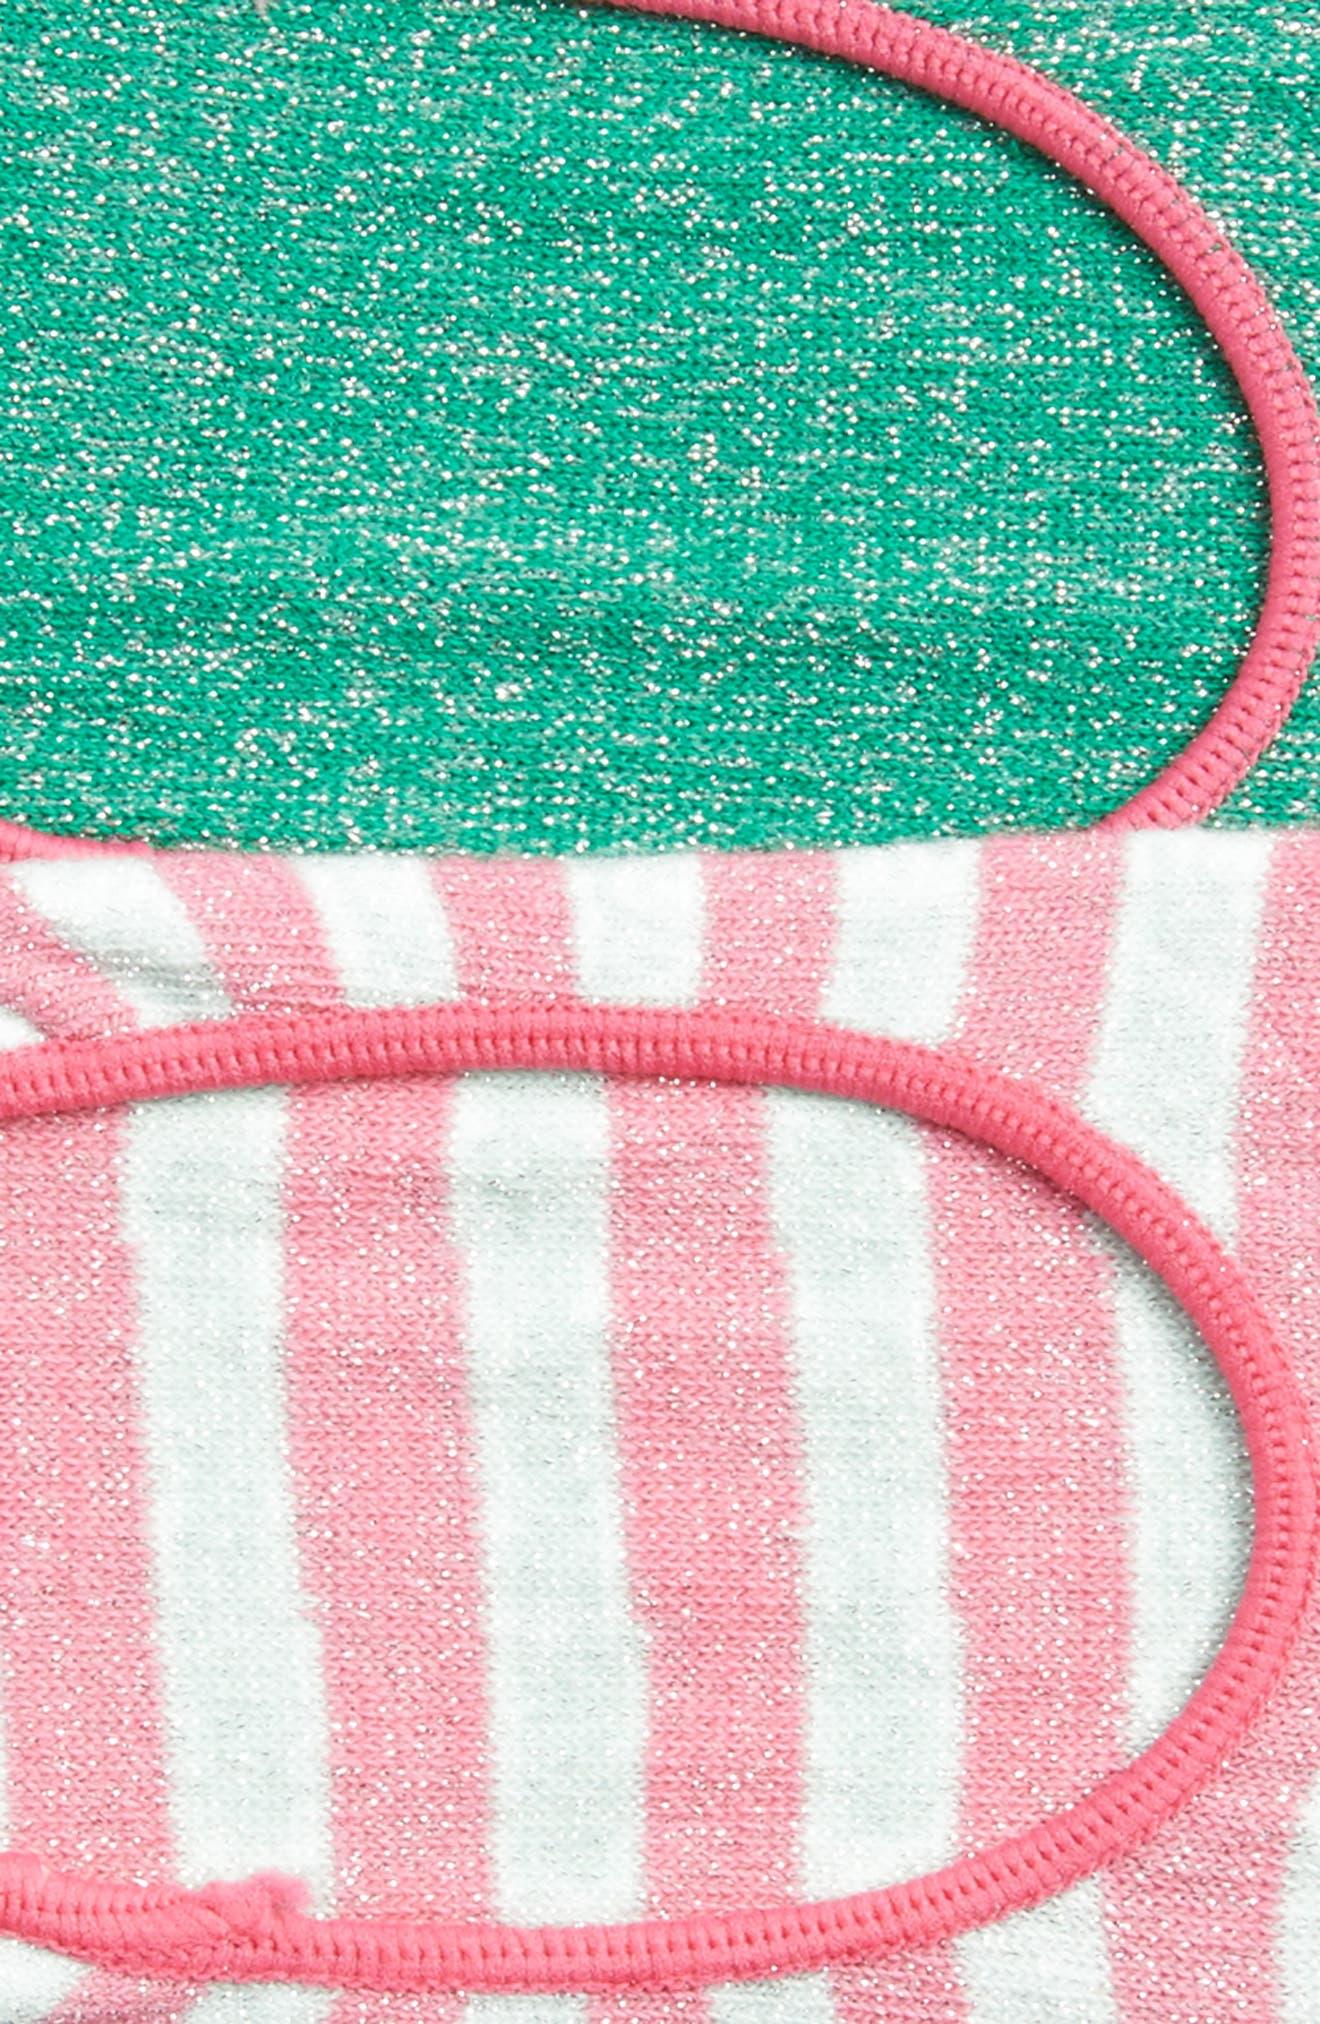 2-Pack Claudia No-Show Socks,                             Alternate thumbnail 2, color,                             Pink